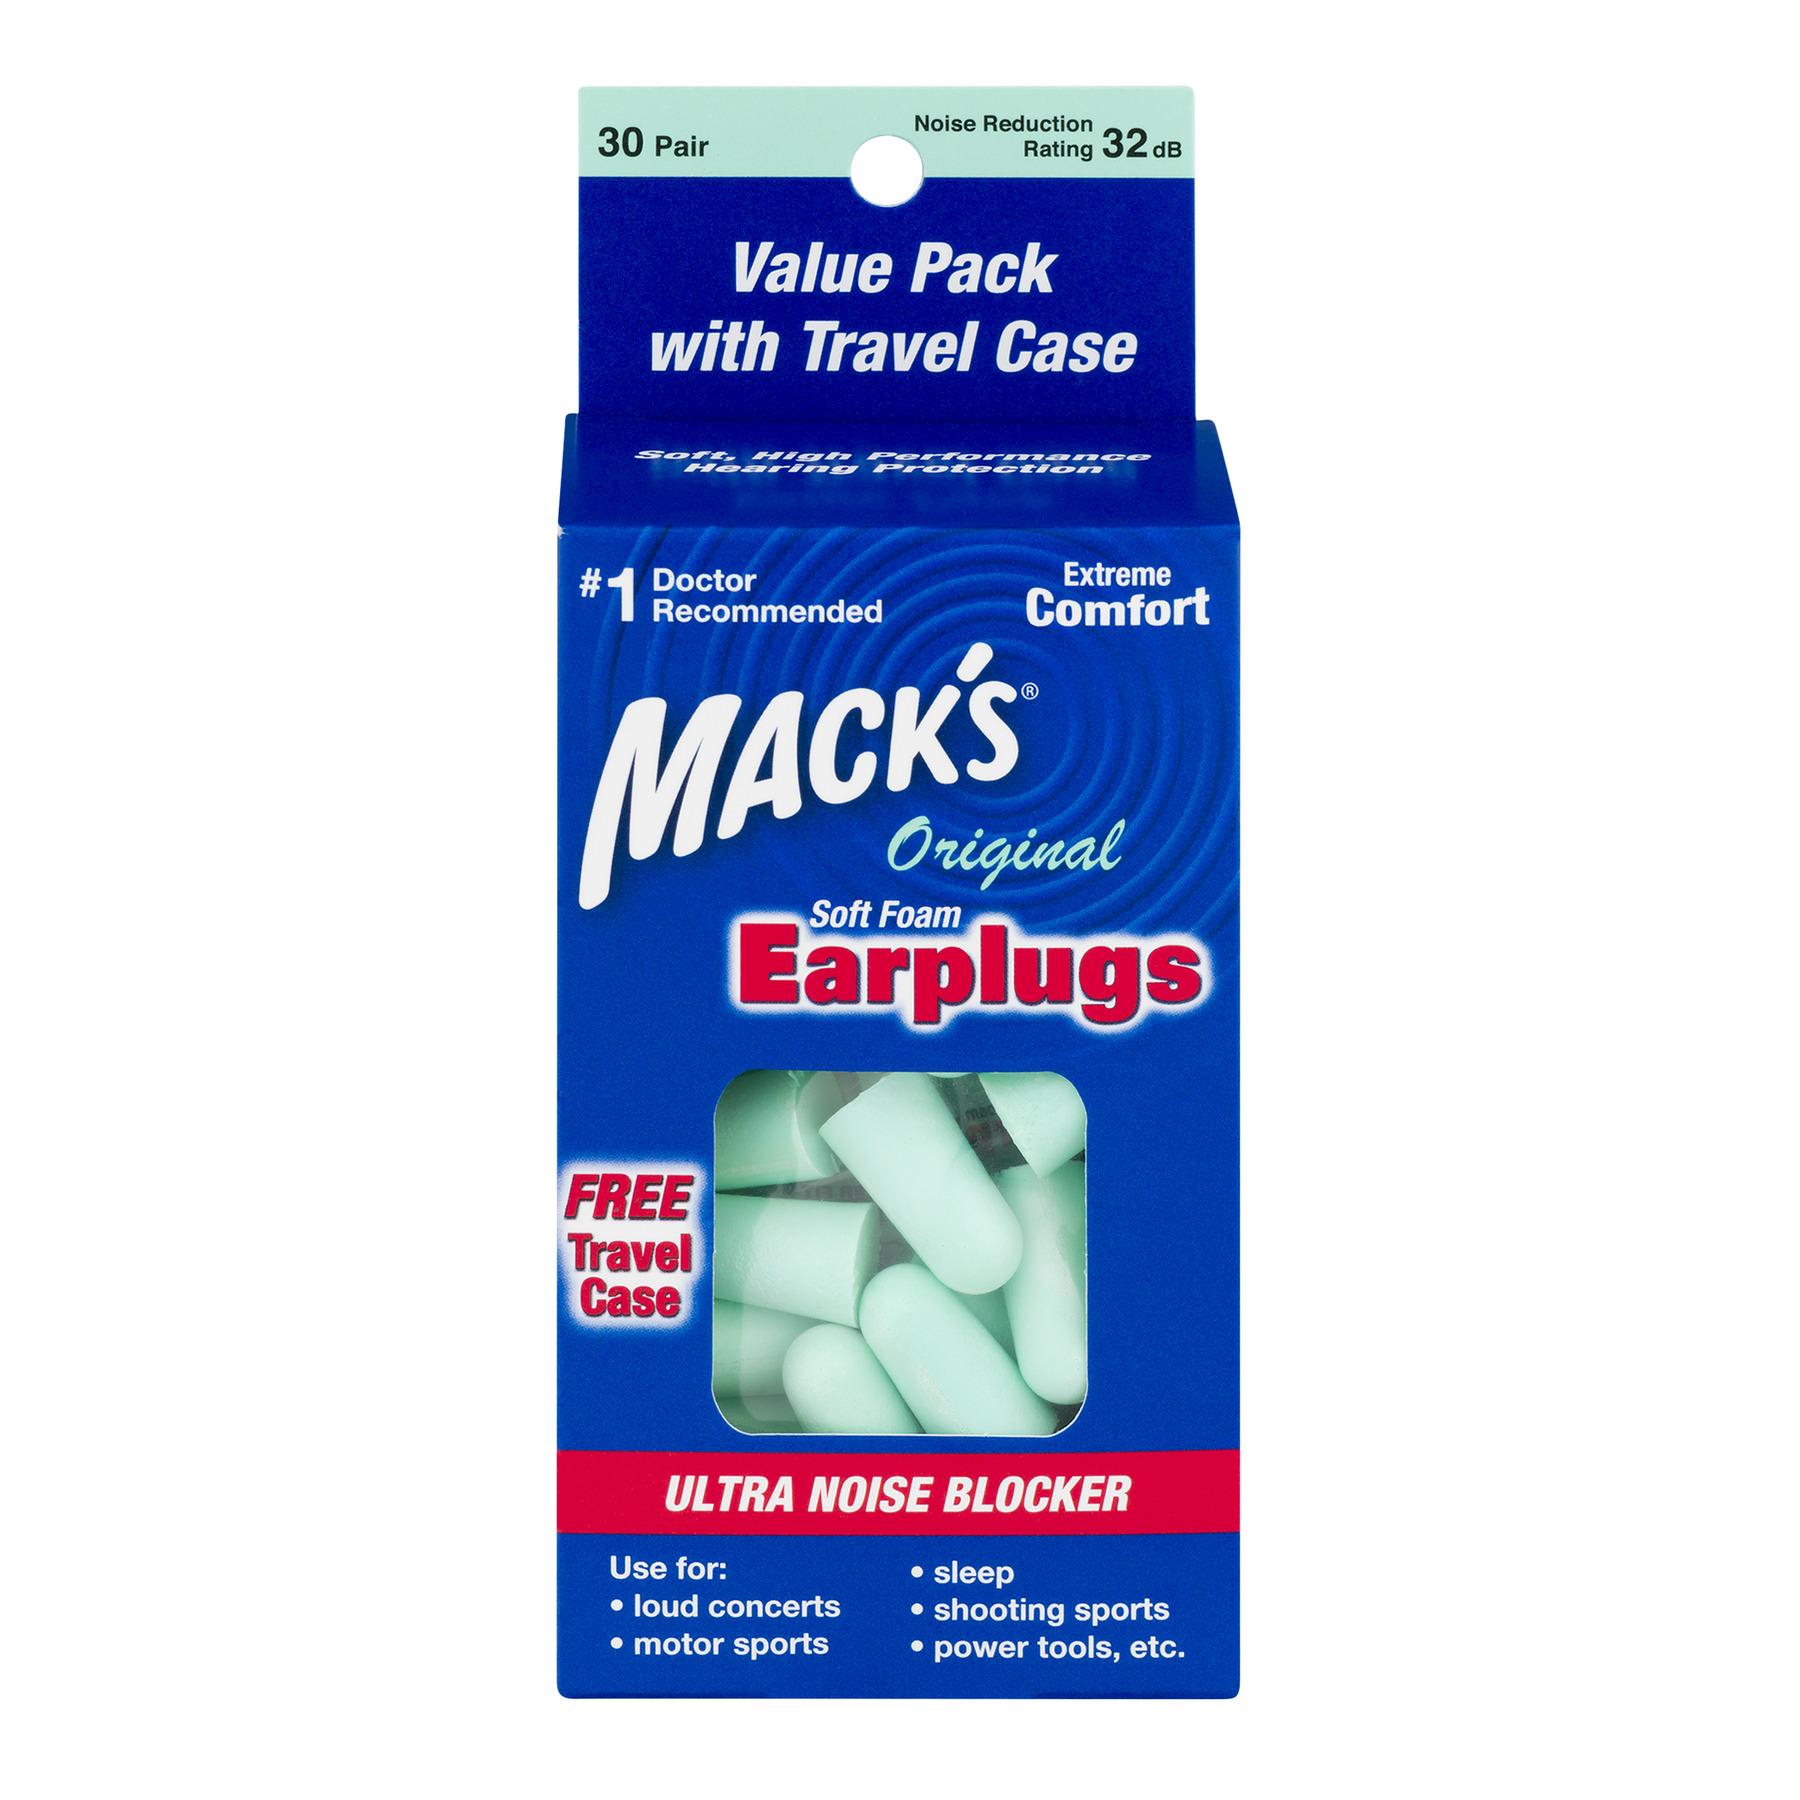 Mack's Original Soft Foam Earplugs 30 Pair